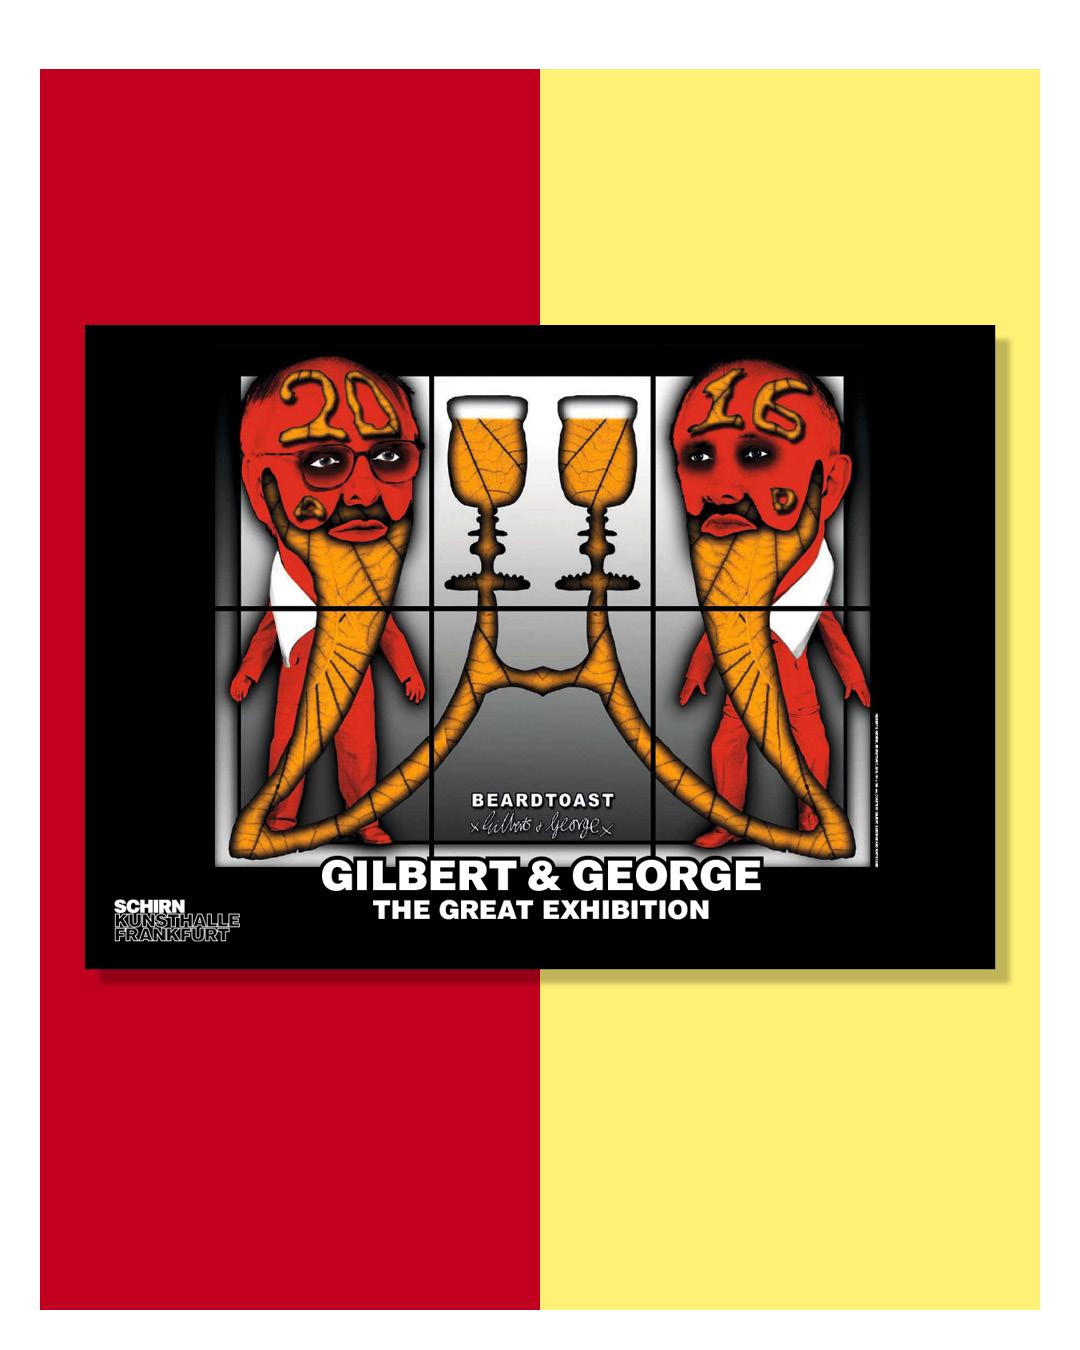 KUNSTDRUCK GILBERT & GEORGE, BEARDTOAST, 2016